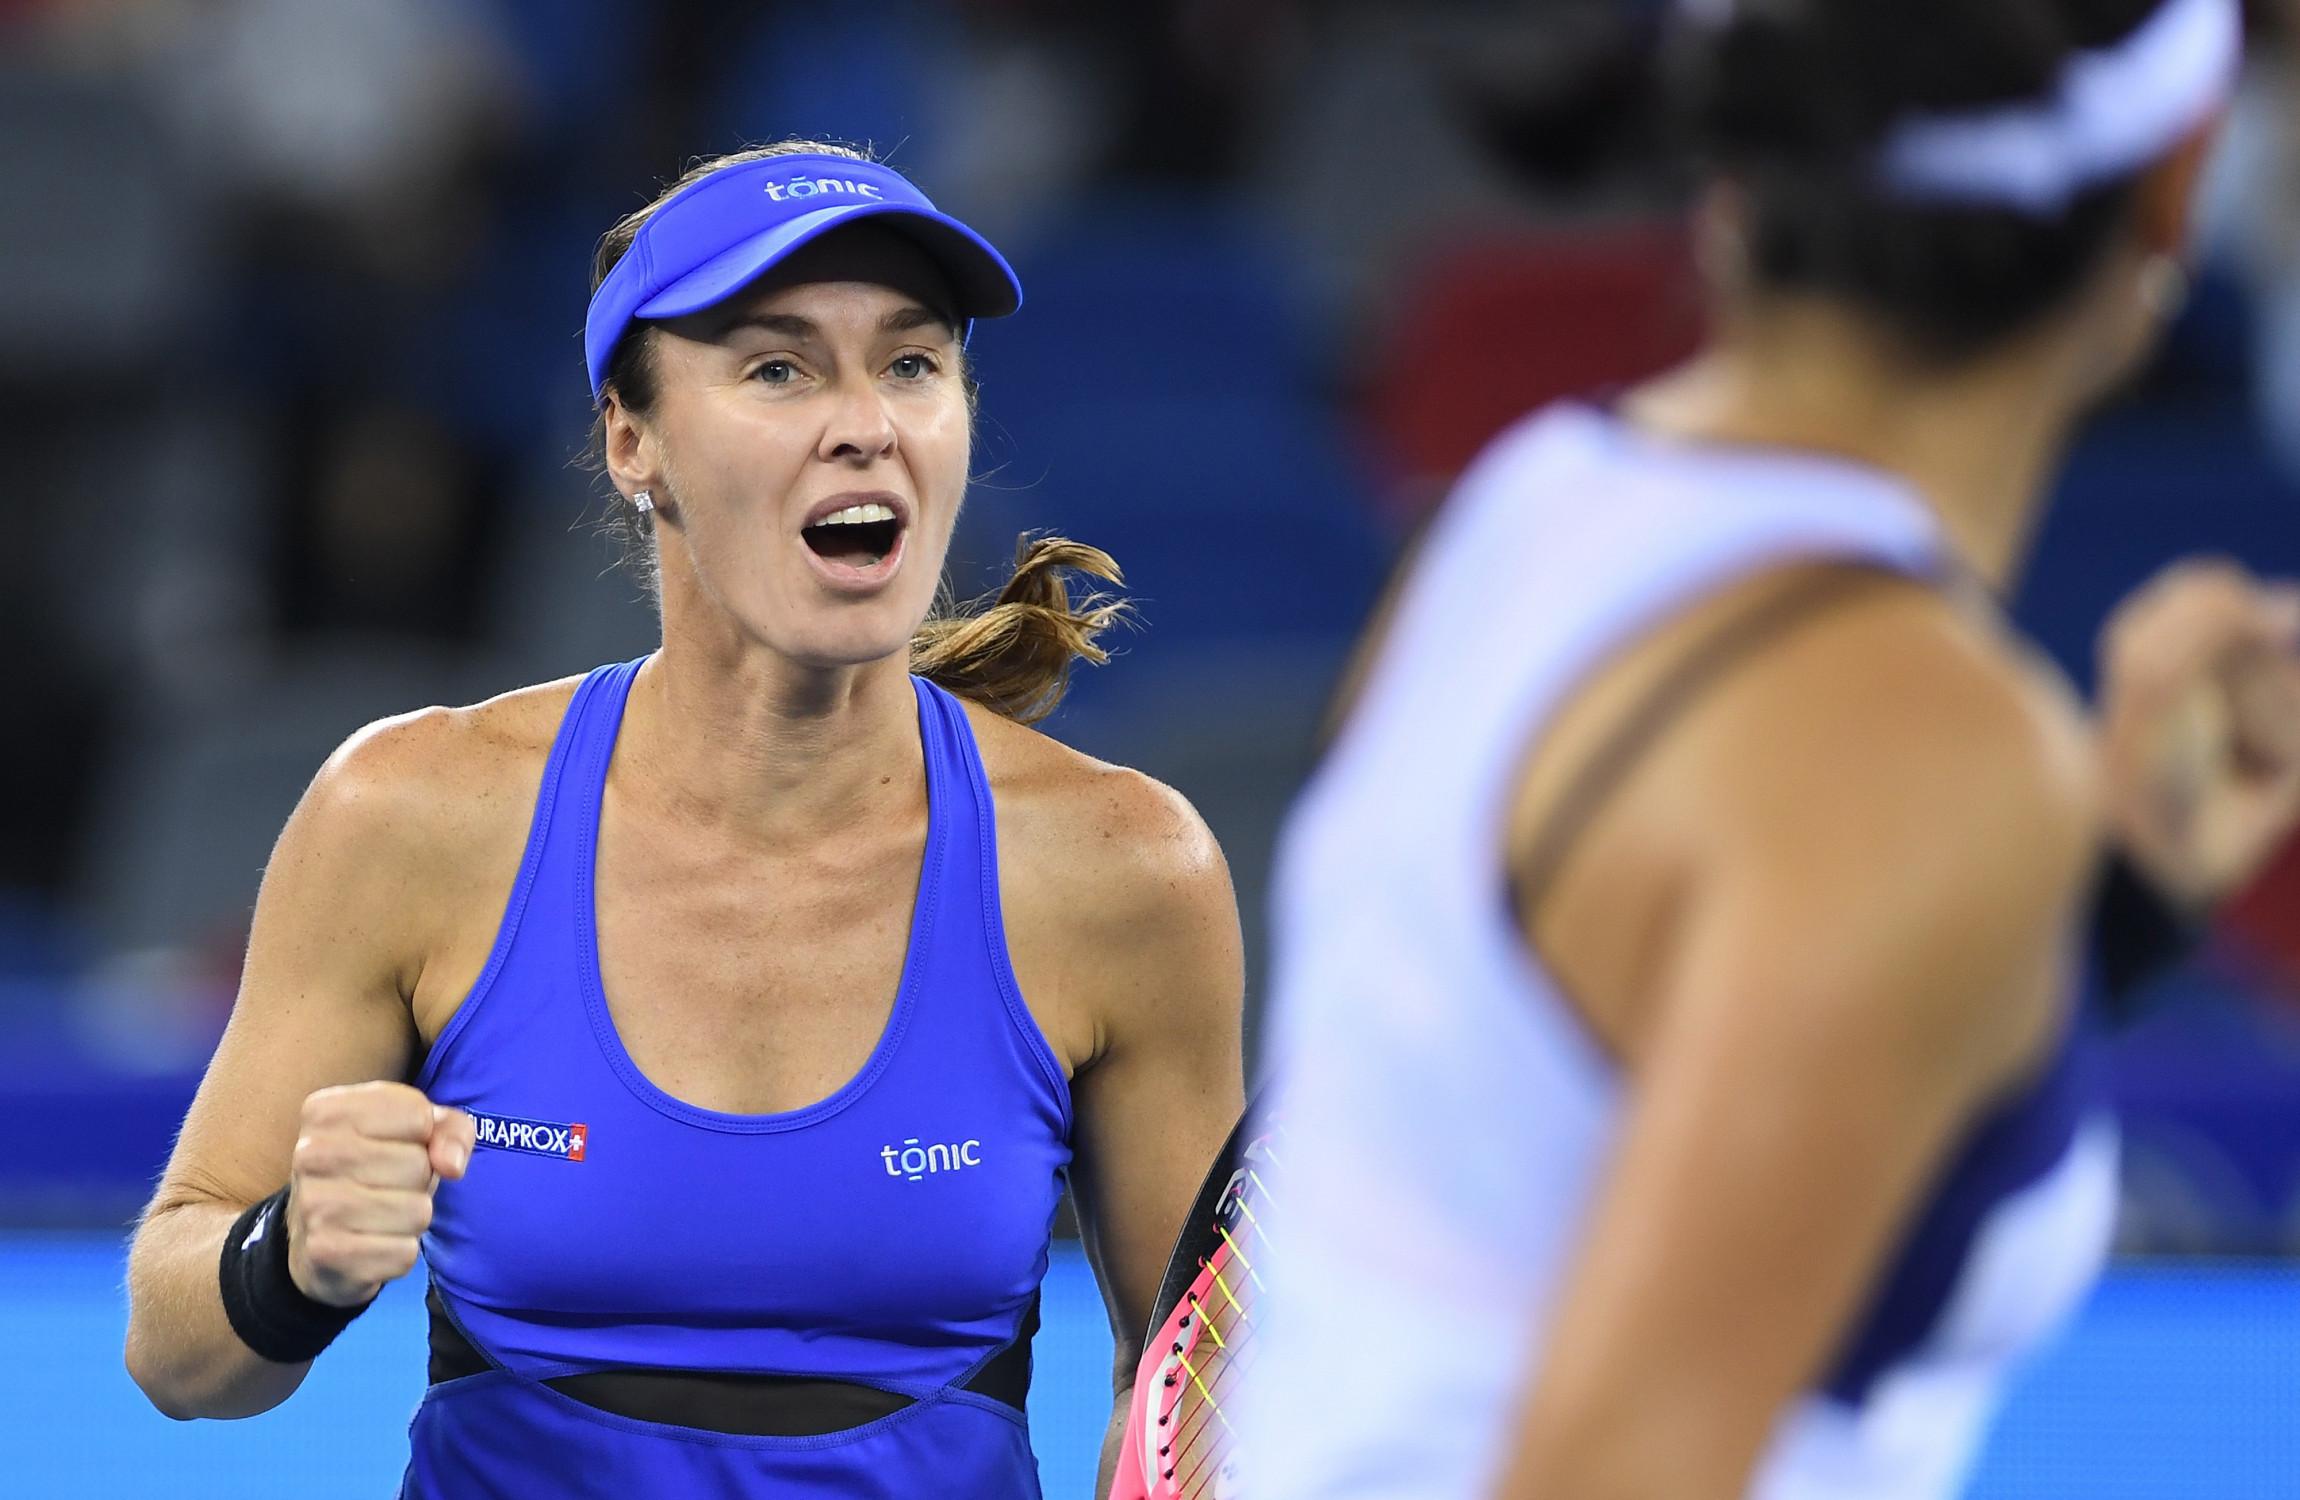 Martina Hingis 5 Grand Slam singles titles